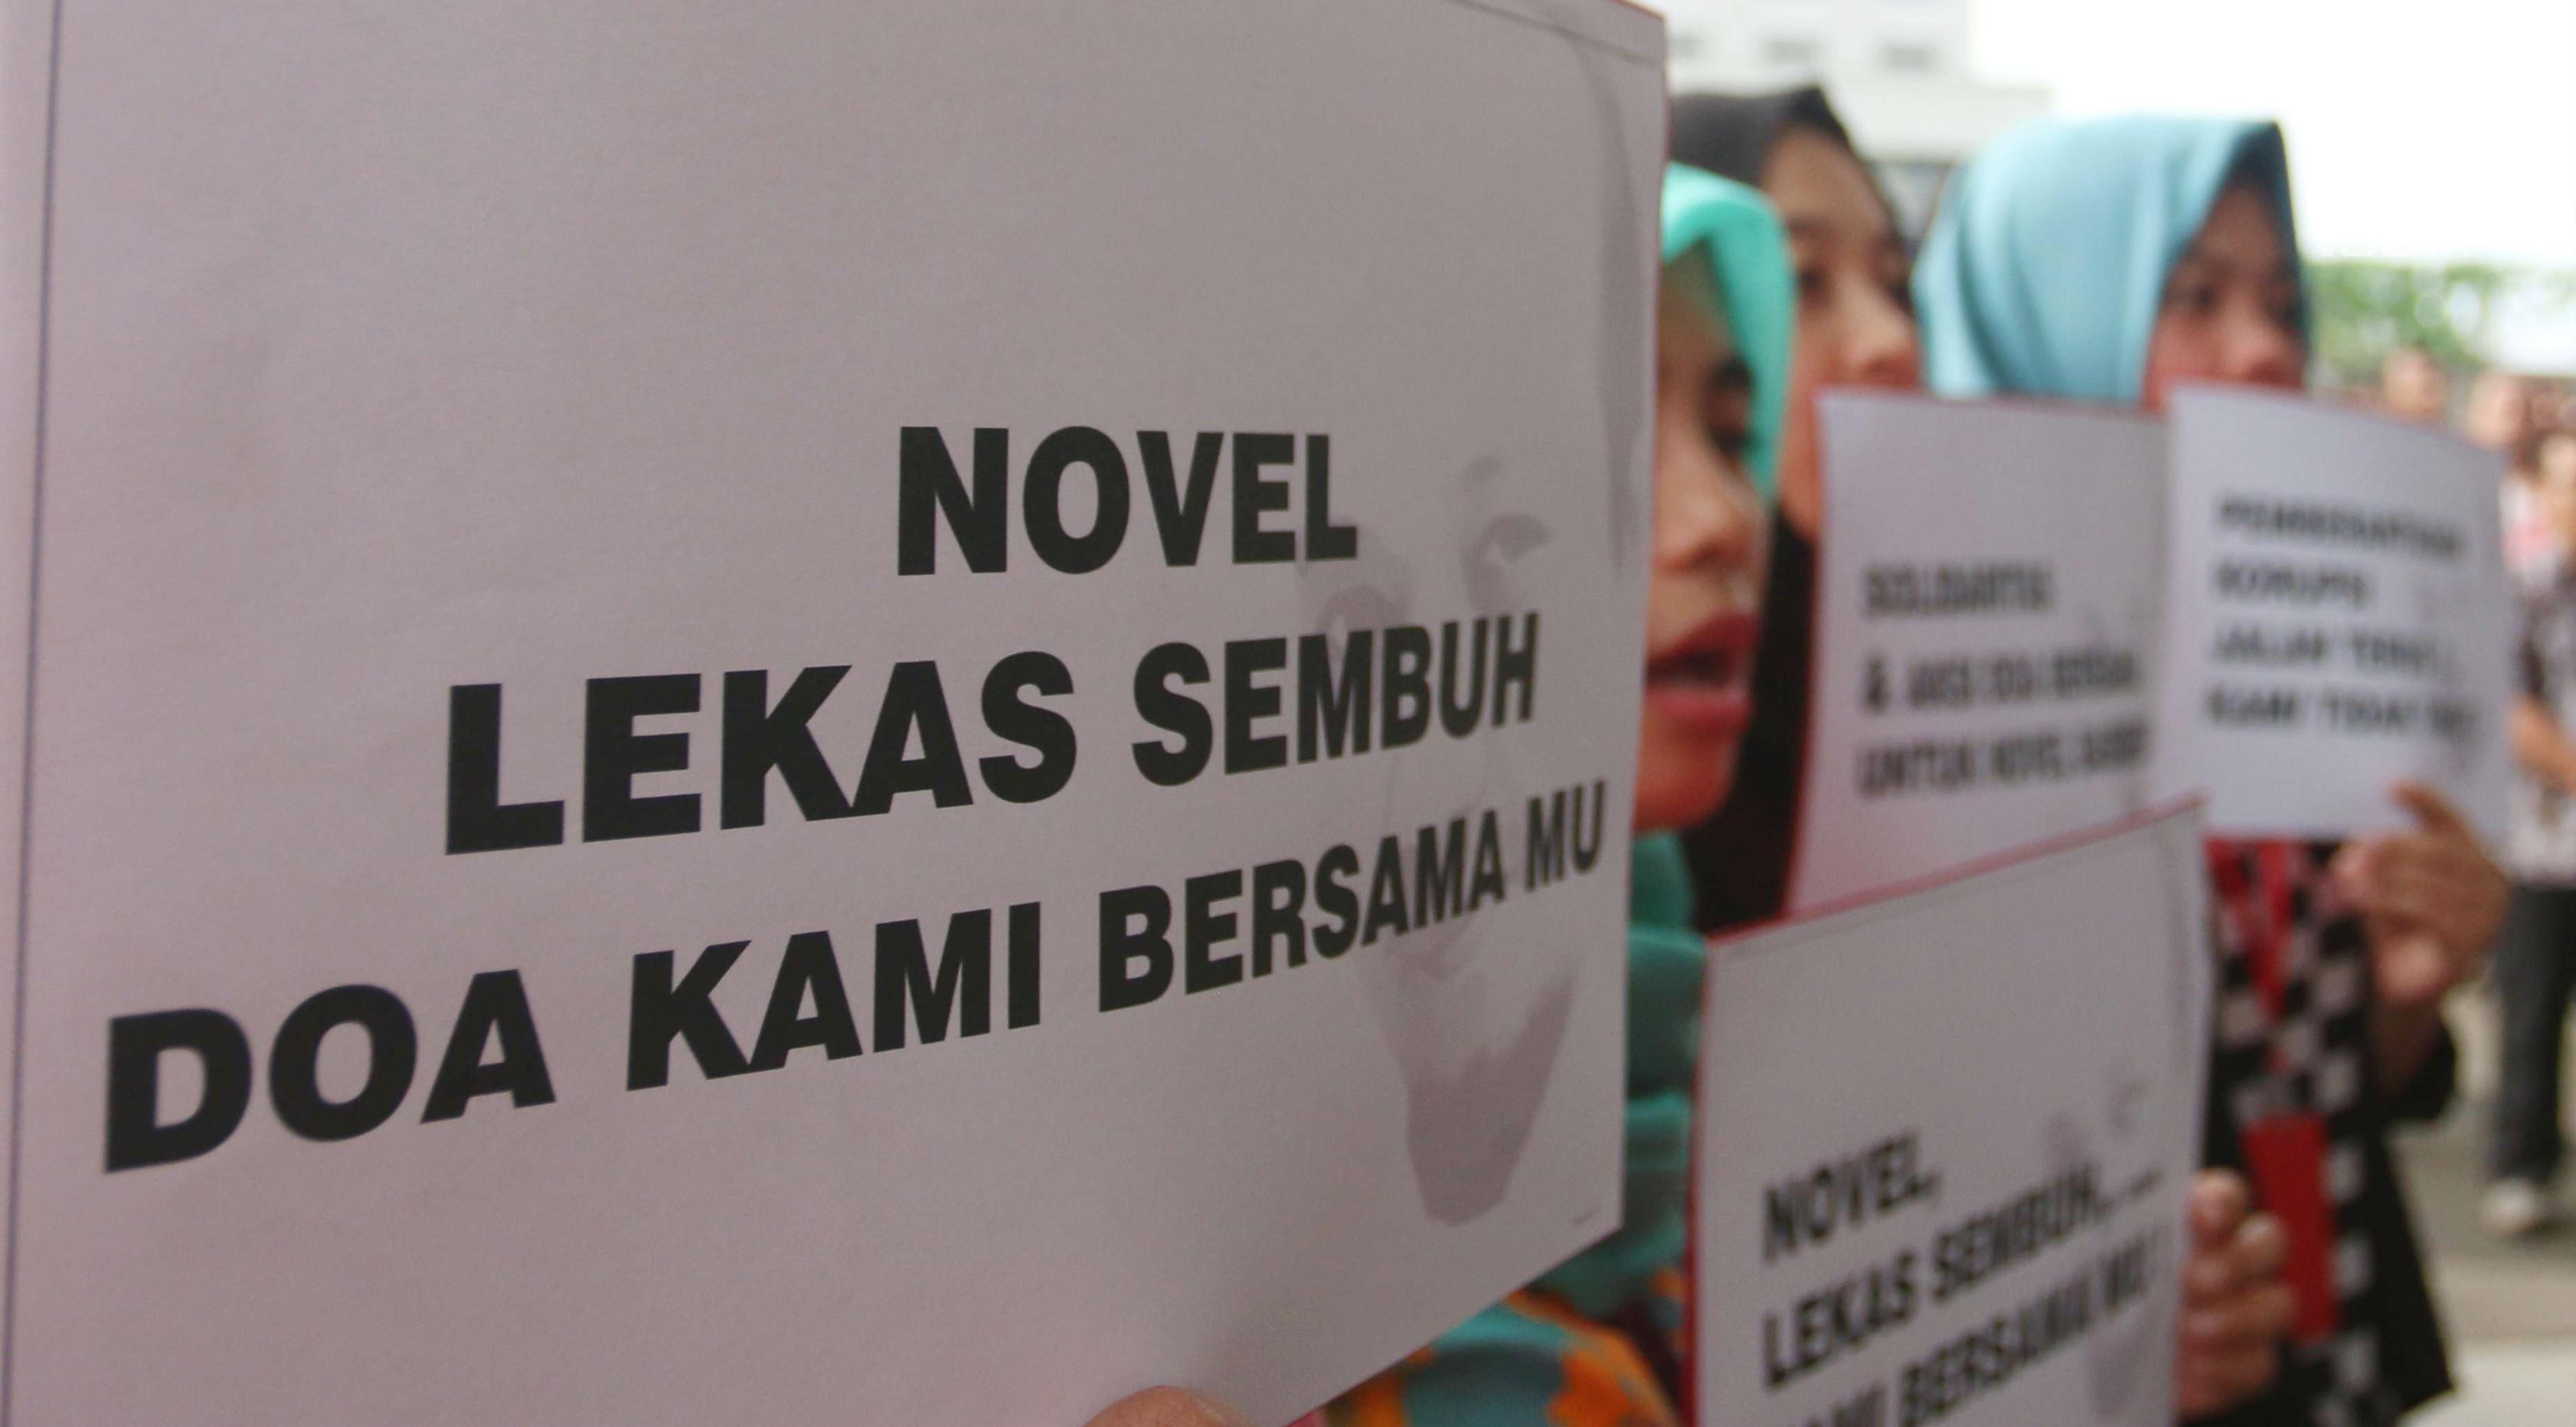 Sejumlah orang membawa poster ungkapan kepedulian saat mengikuti aksi peringatan 100 hari penyerangan Novel Baswedan di gedung KPK, Jakarta, Kamis (20/7). (Liputan6.com/Helmi Afandi)